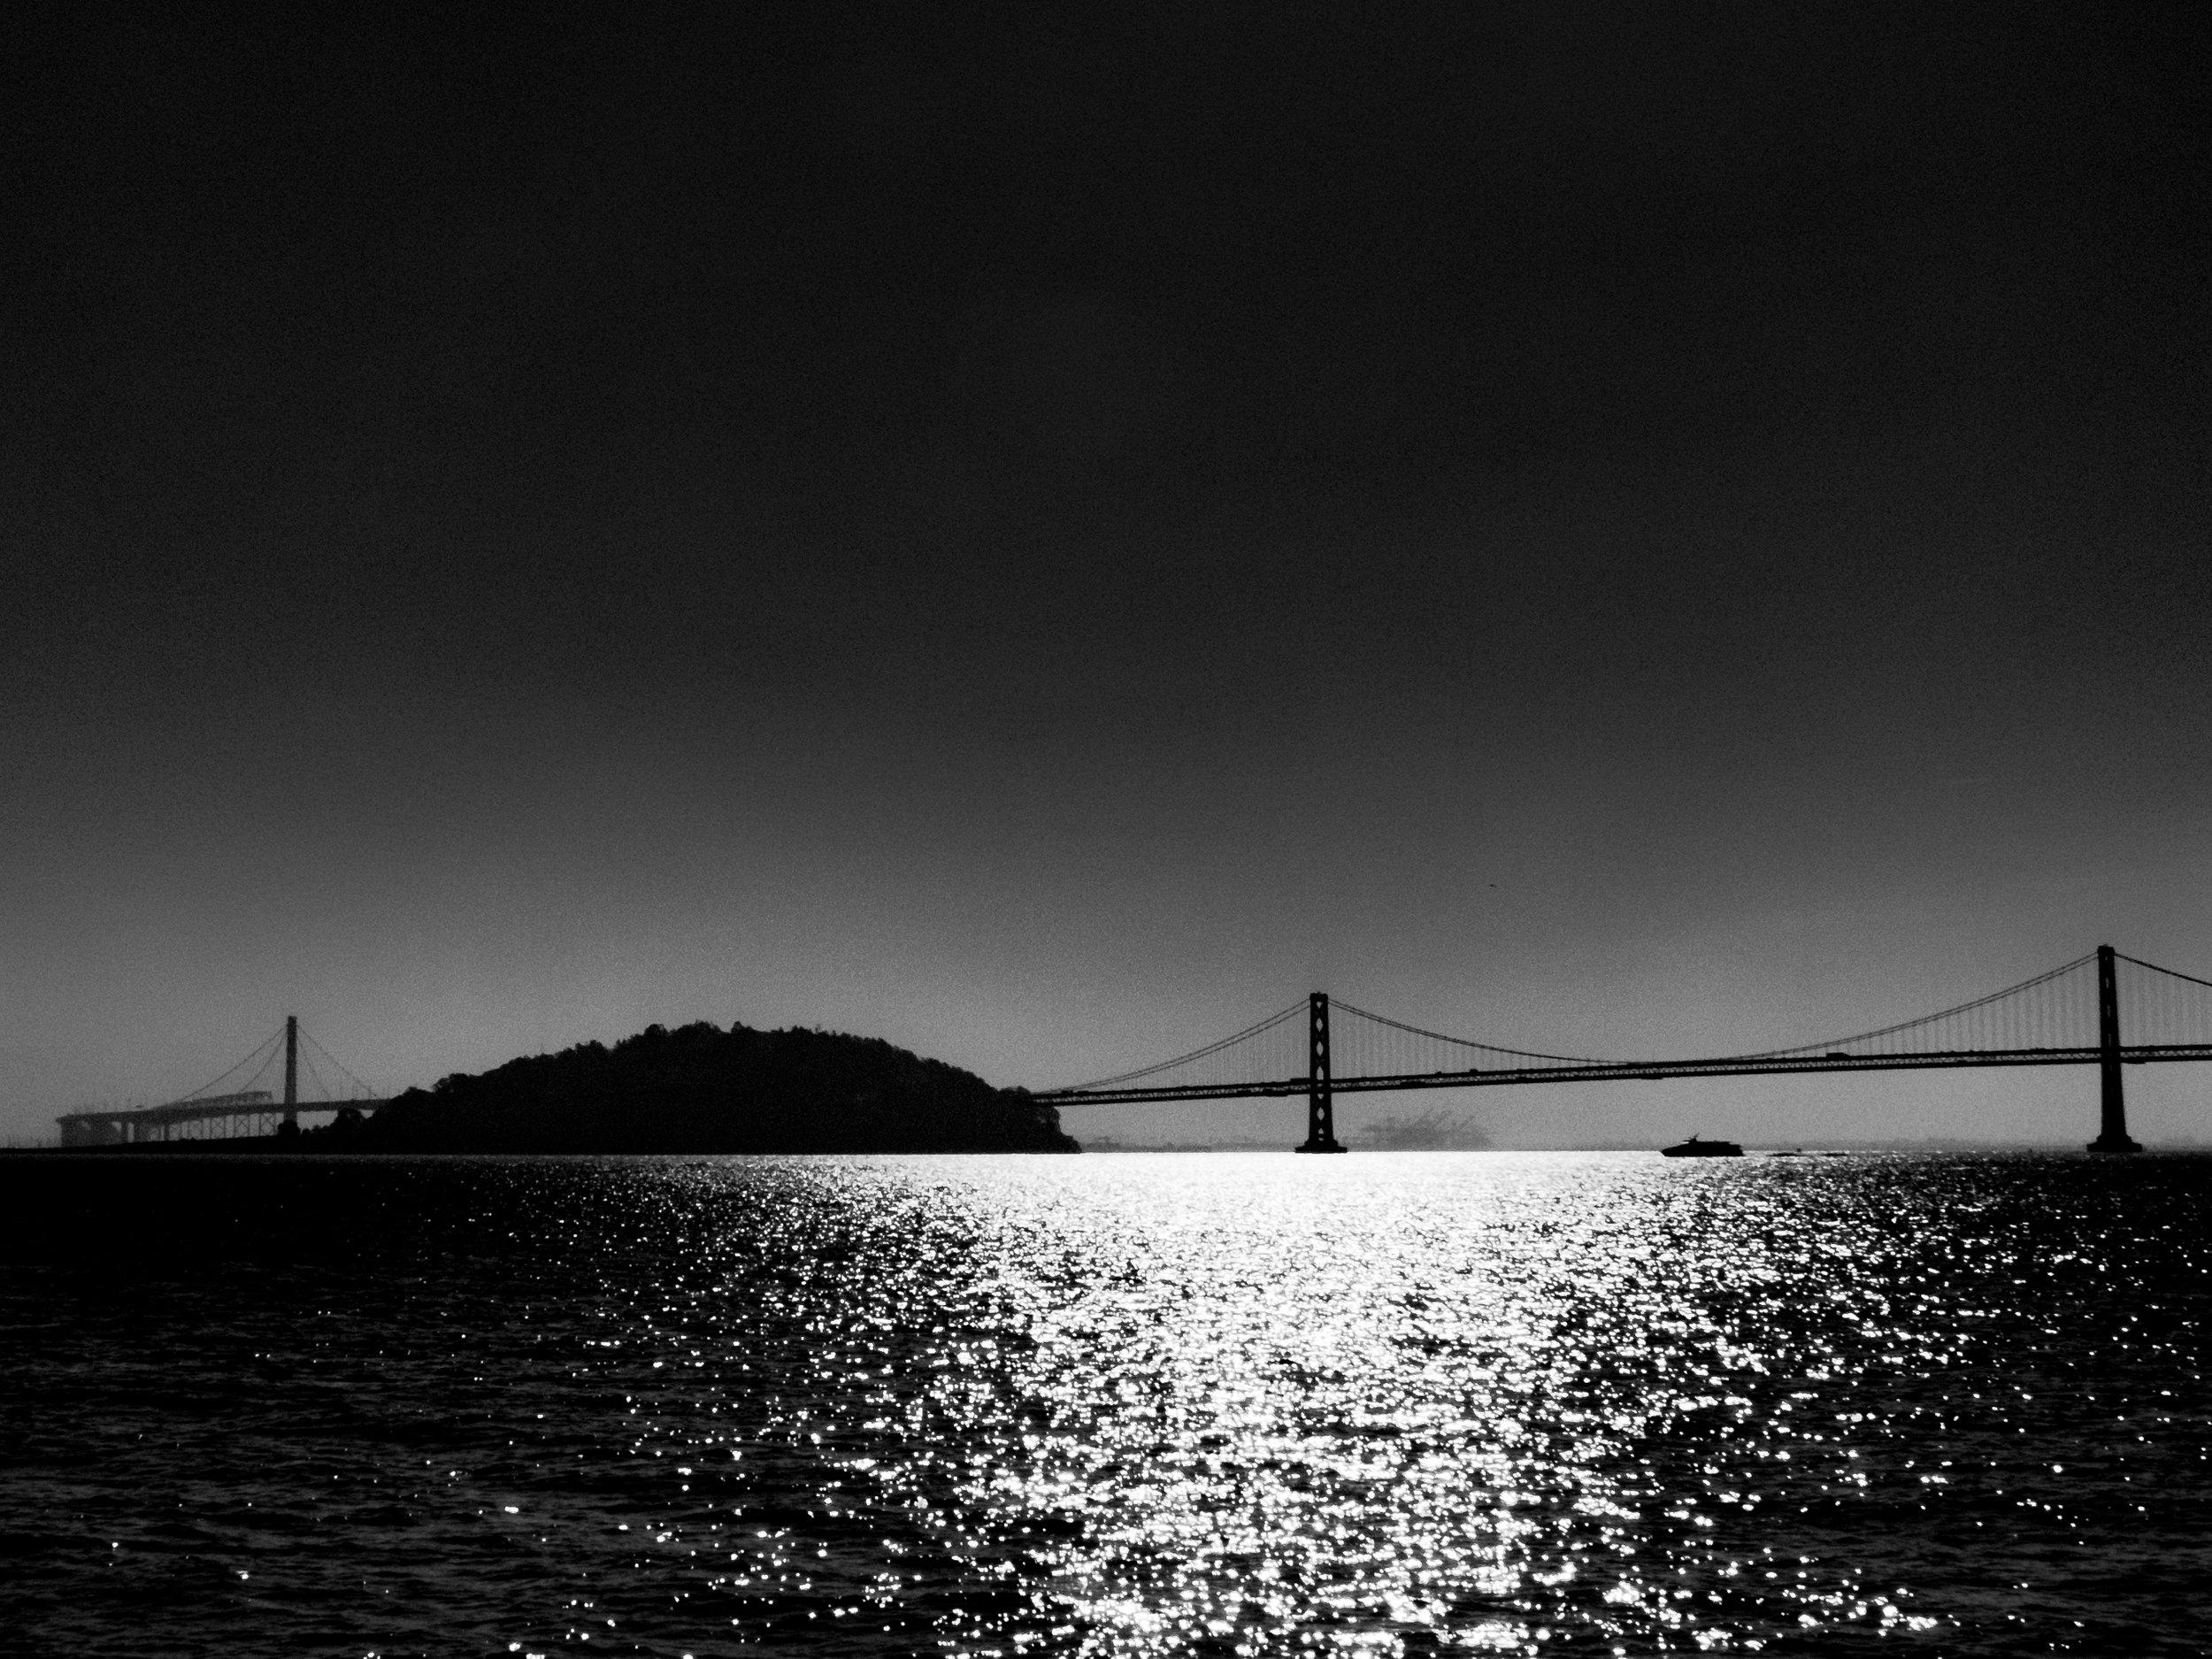 San Francisco - Oakland Bay Bridge, 2015